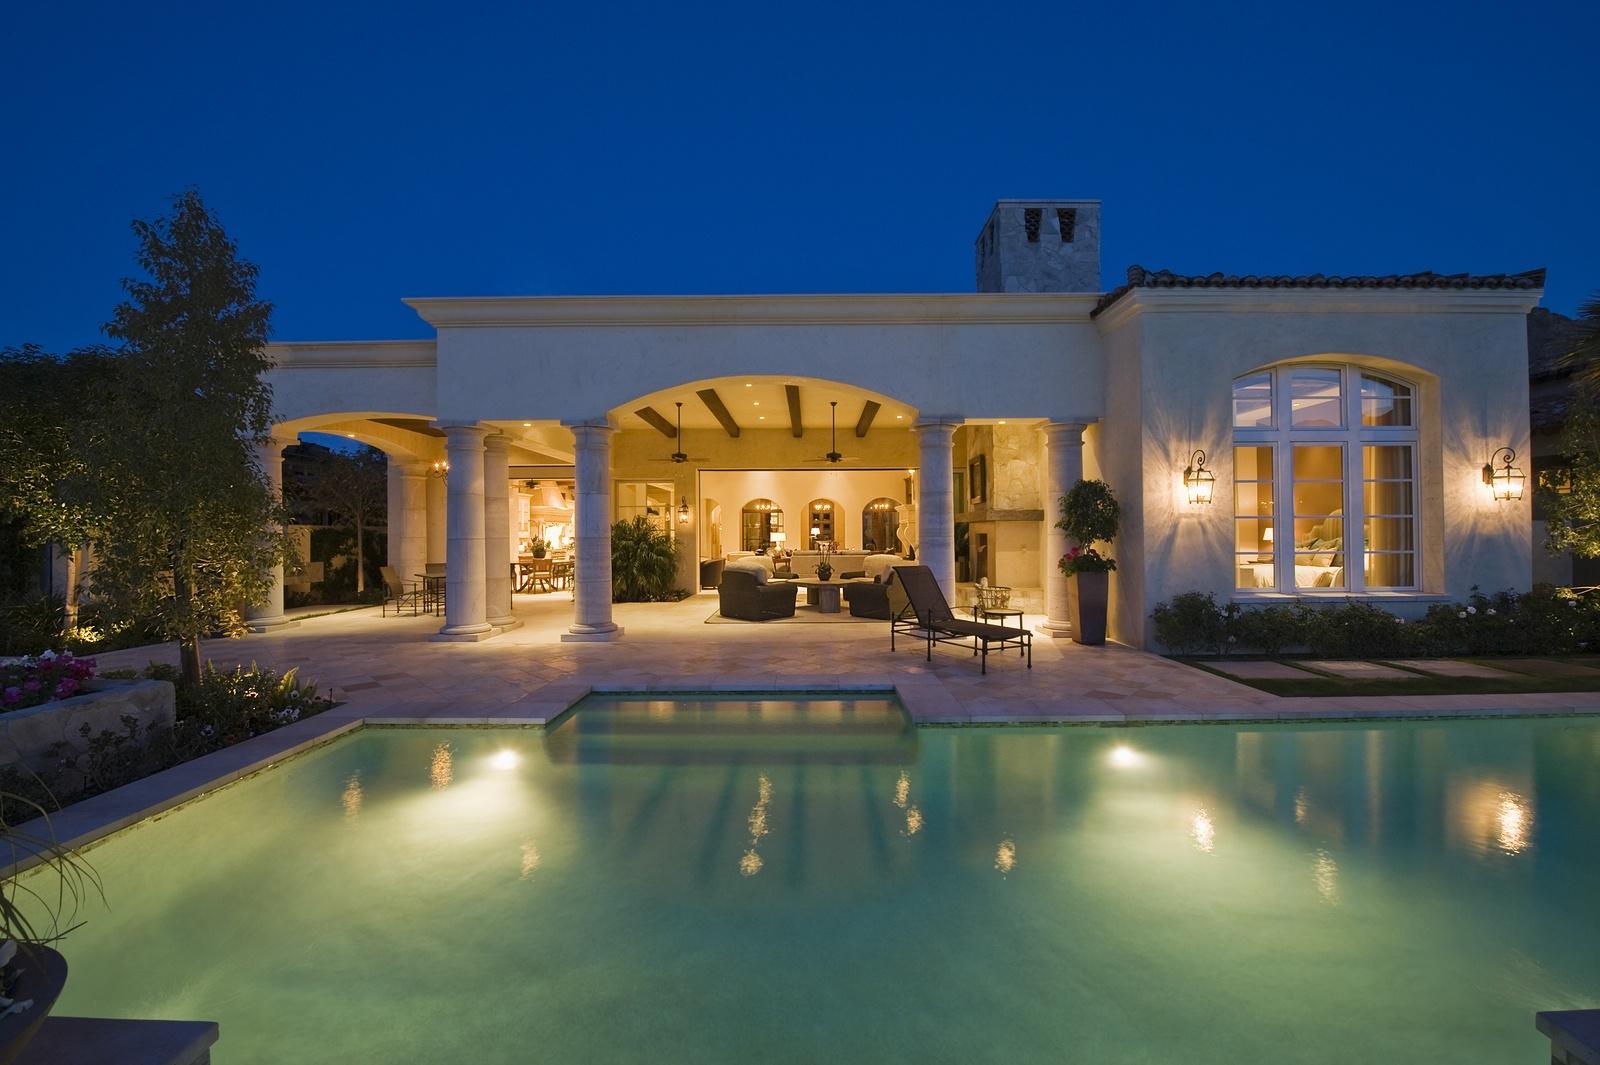 bigstock-Lit-swimming-pool-and-building-48713813